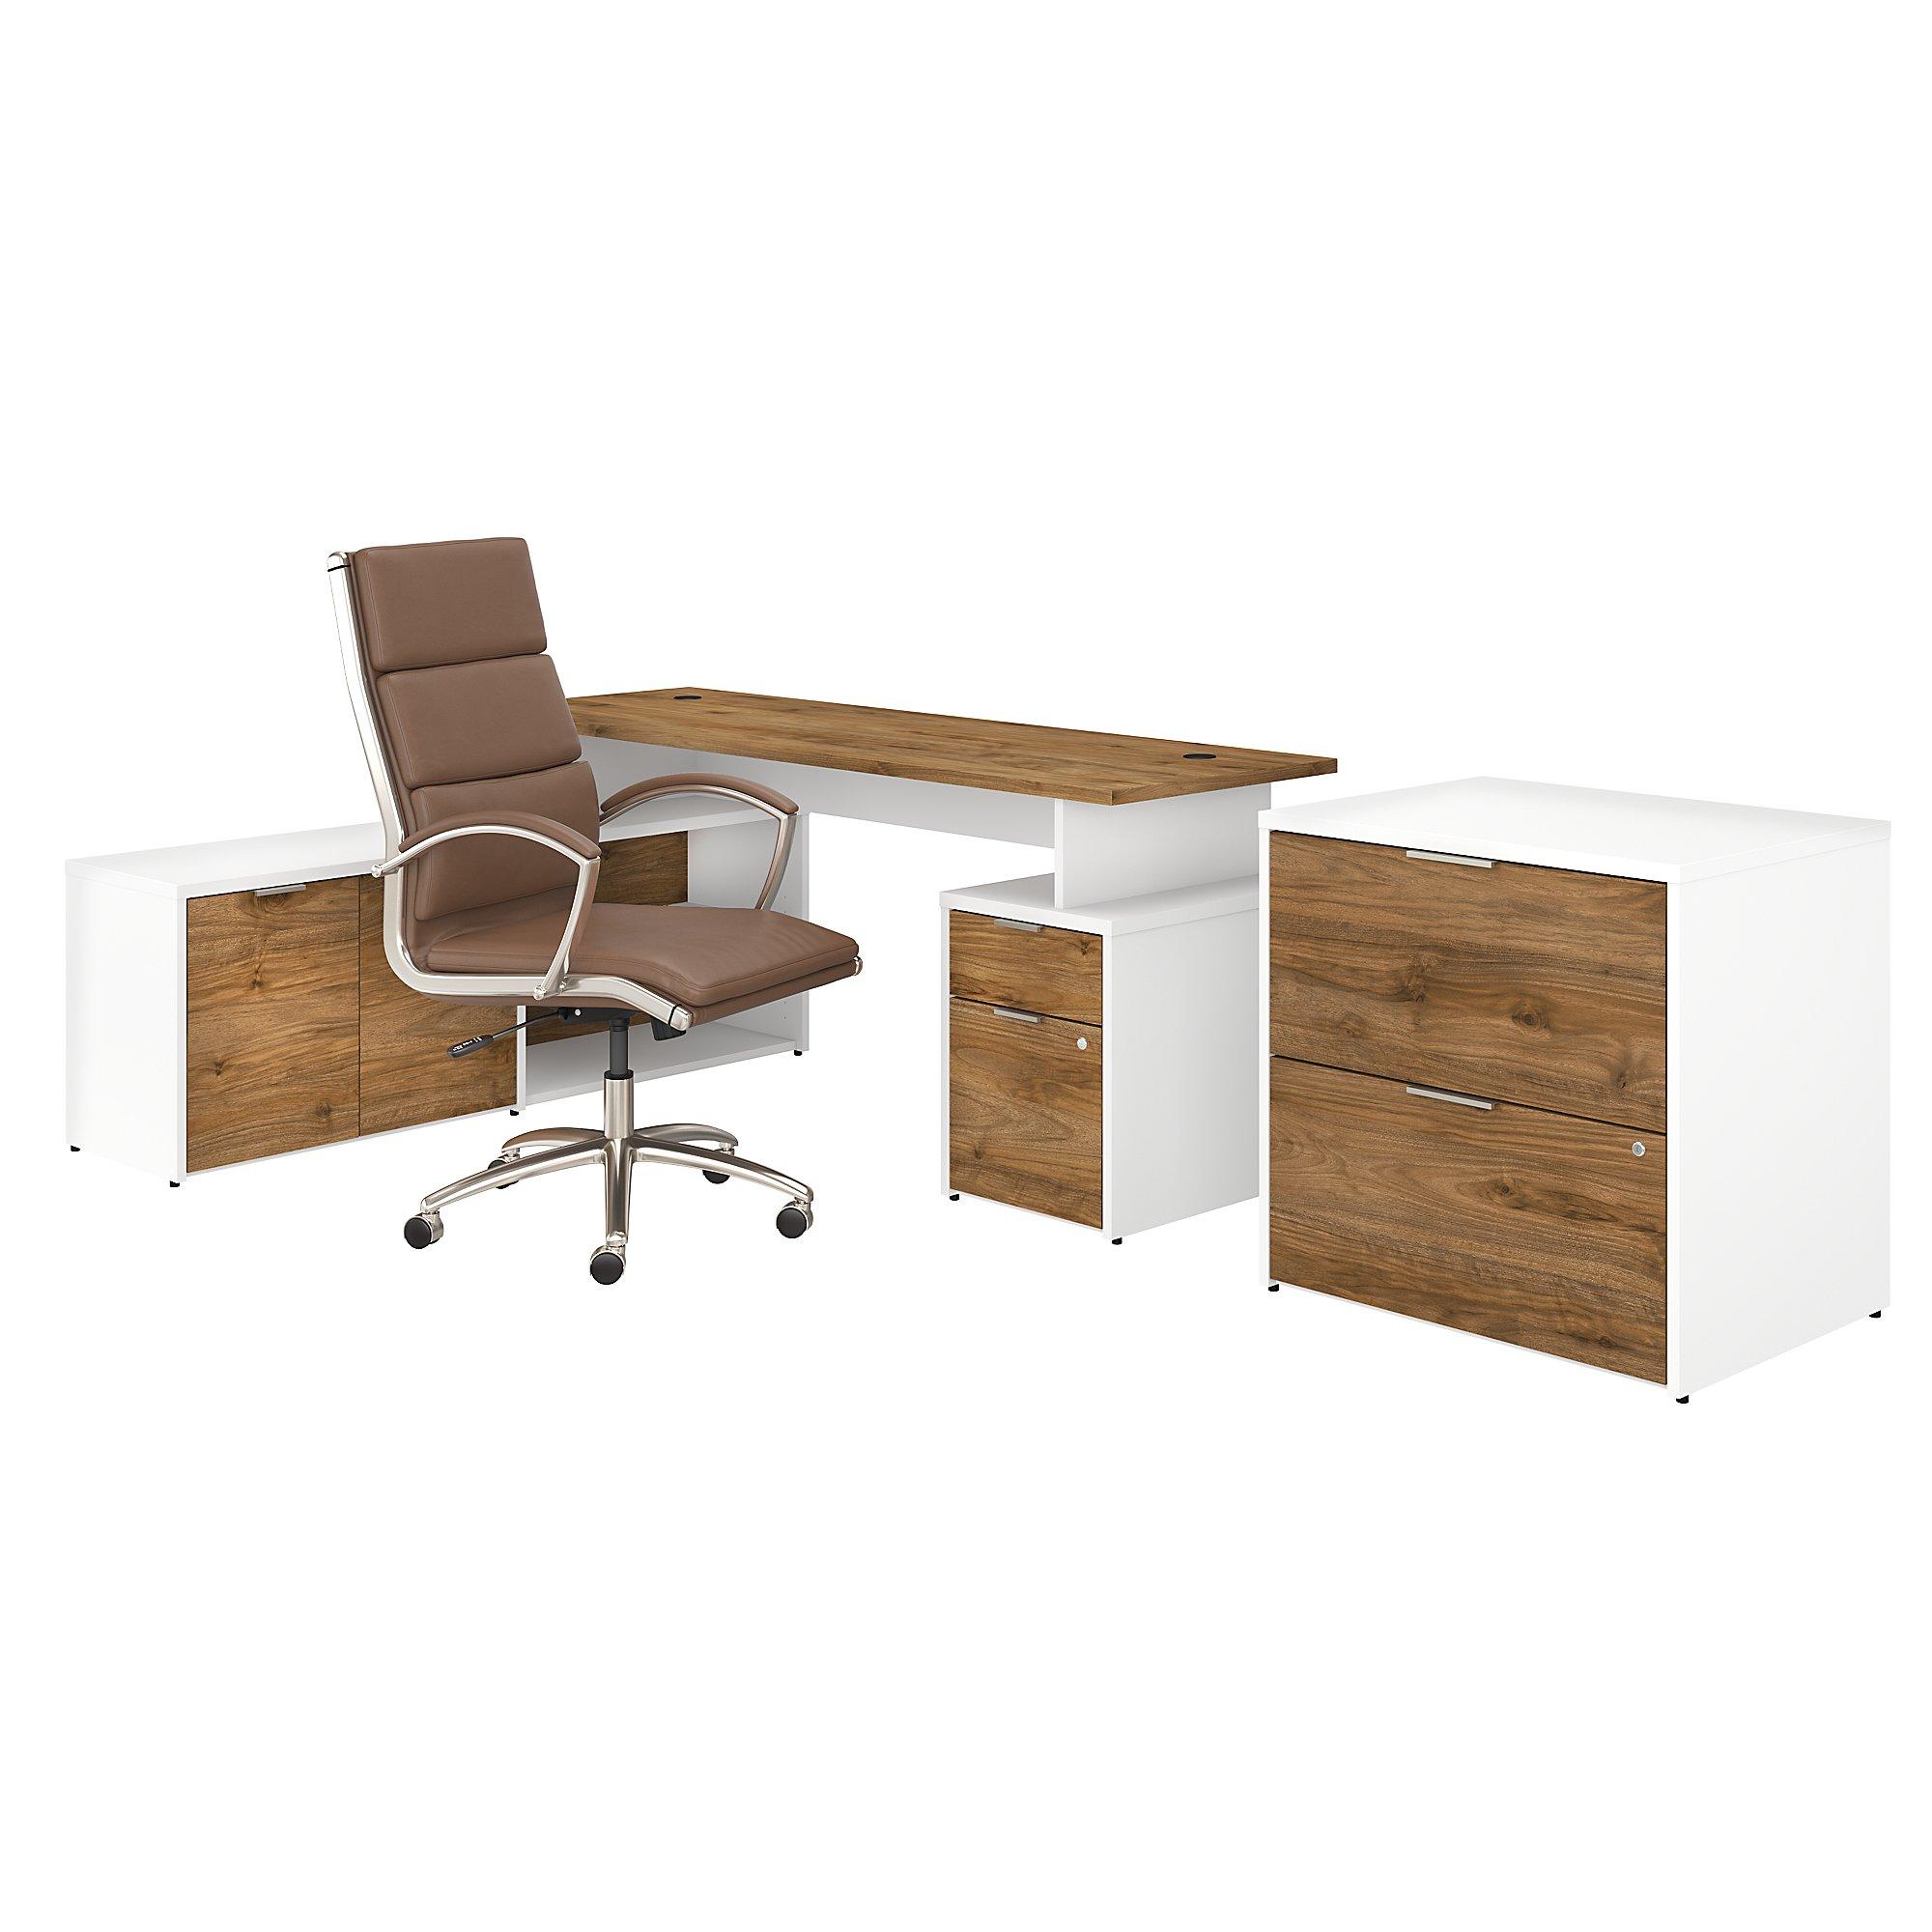 jamestown walnut desk configuration with chair